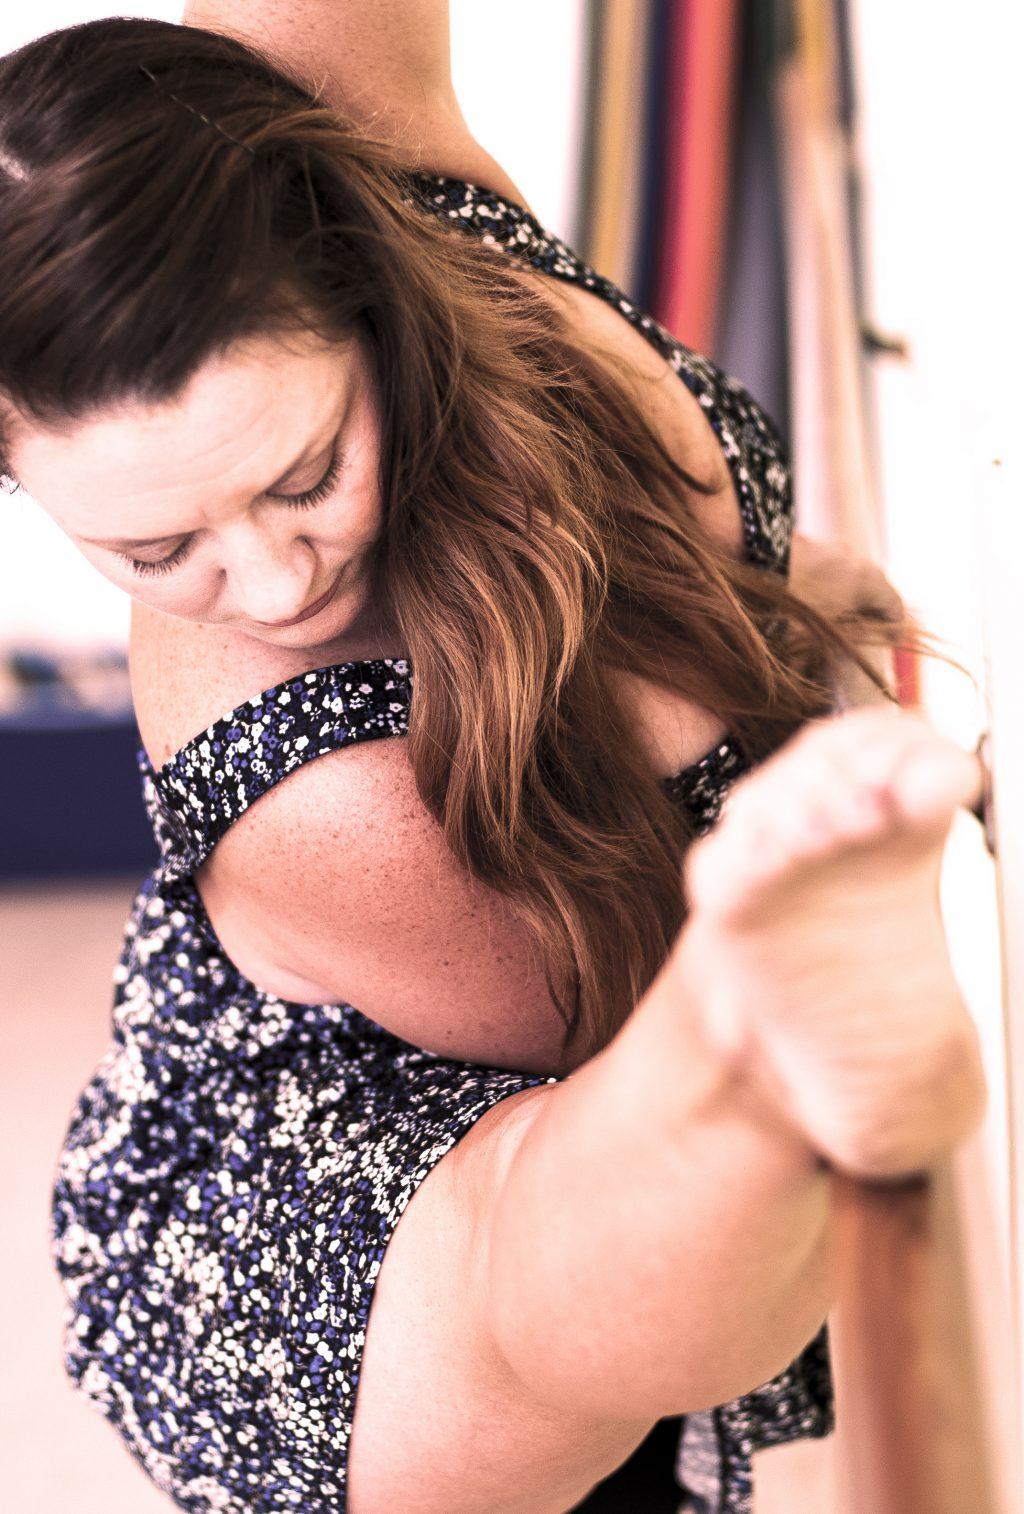 Choreographer and Dance Studio Owner Shannon Thomas